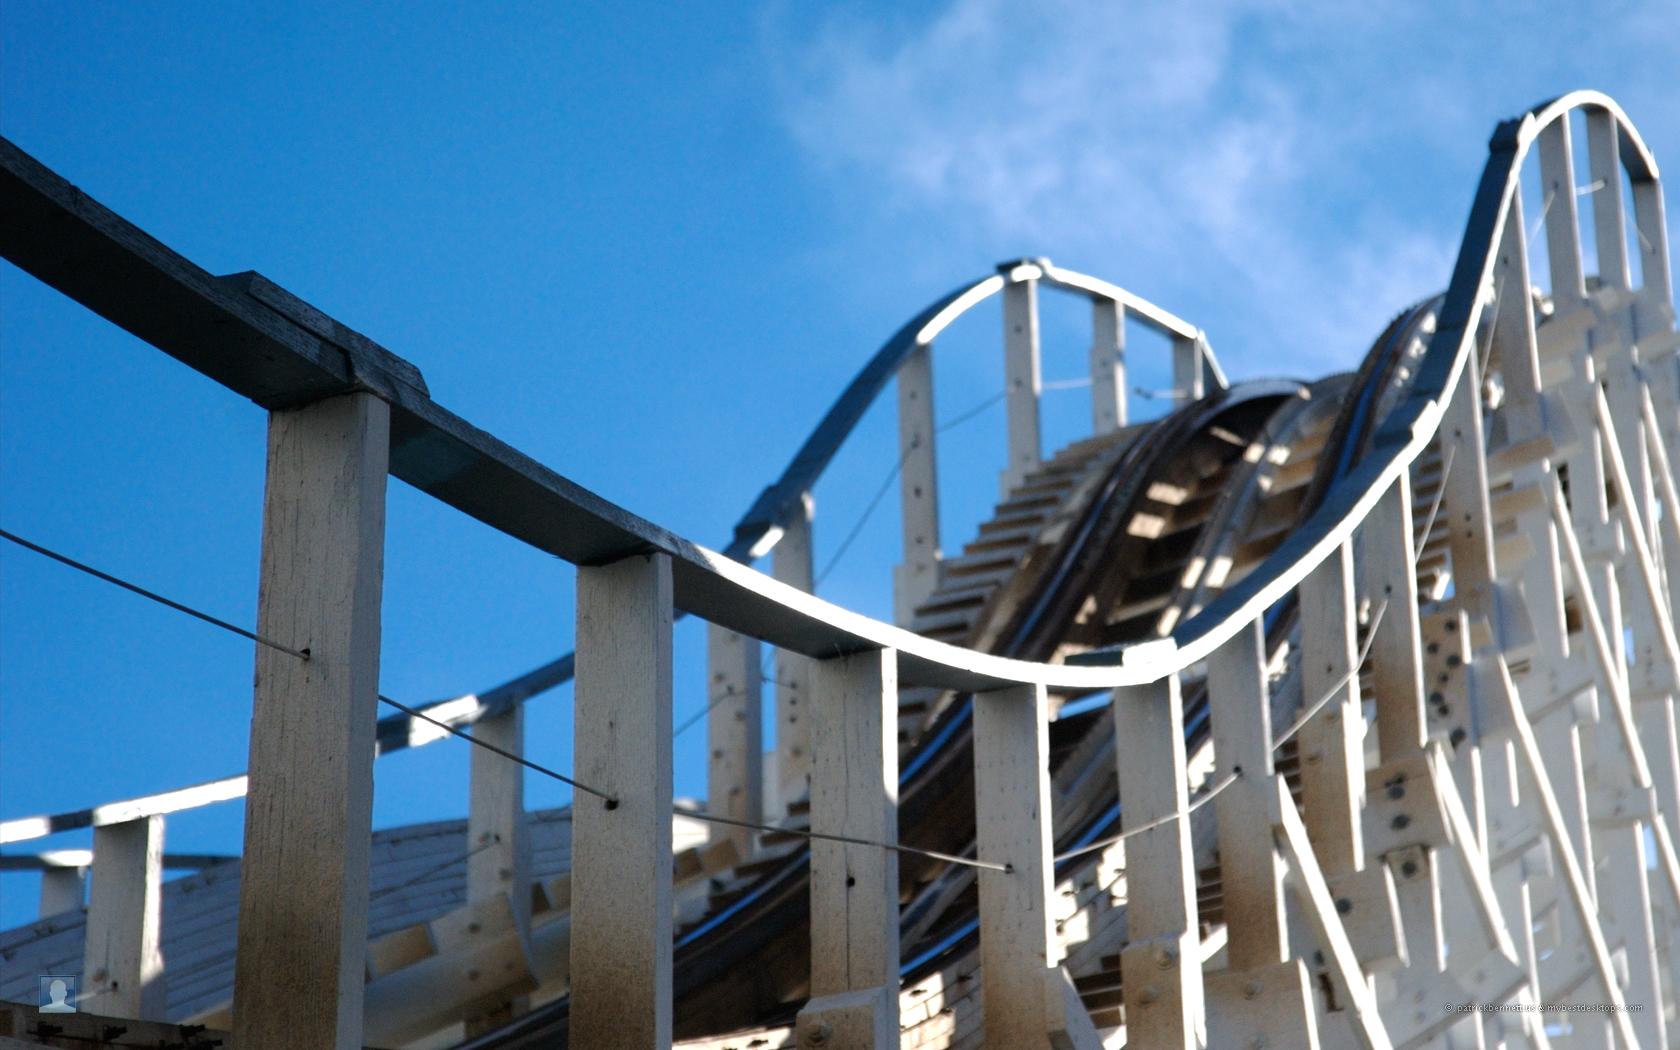 Wooden Roller Coaster Wooden rollercoaster 1680x1050